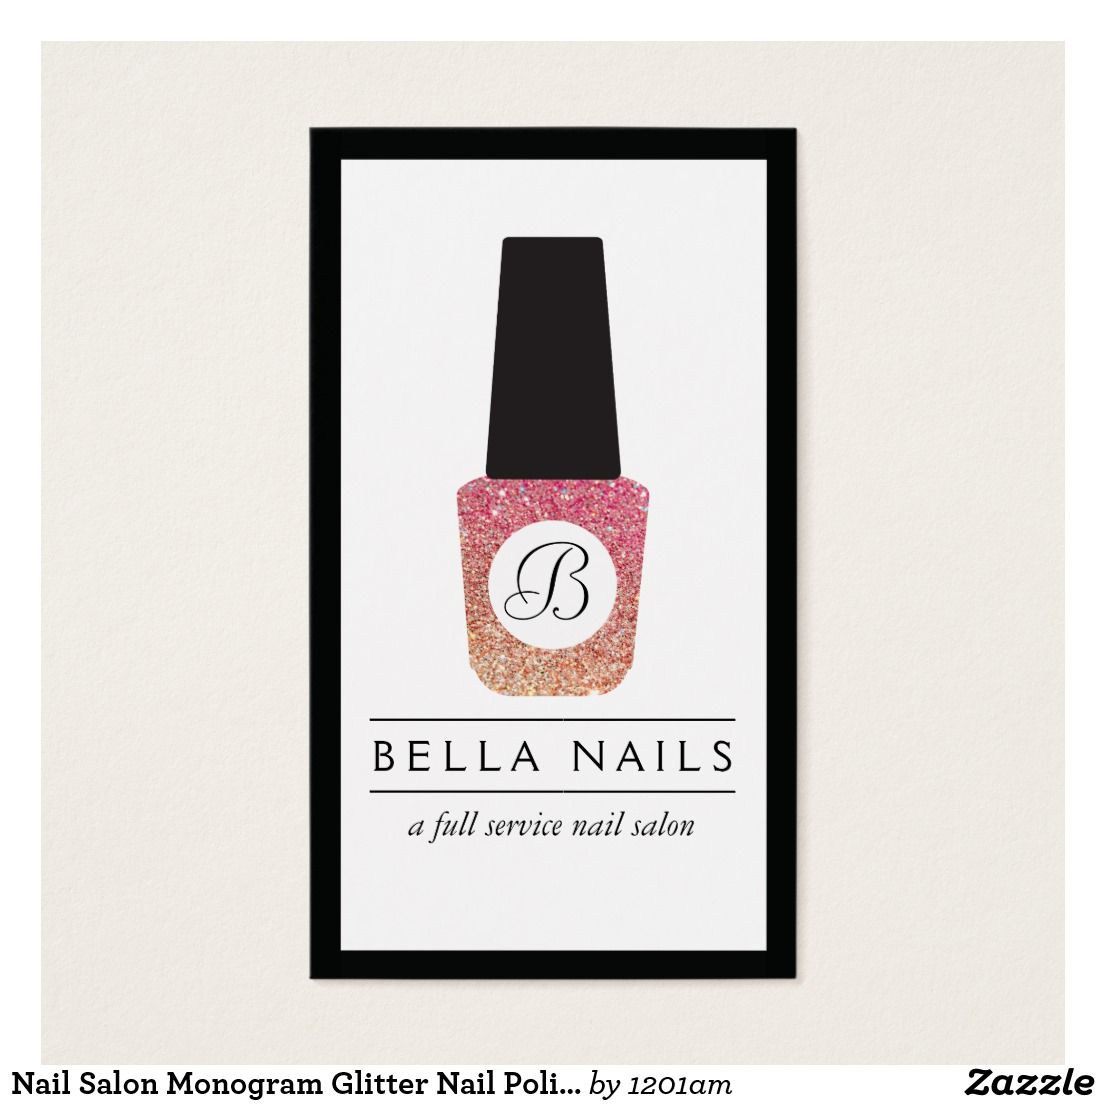 Nail Salon Monogram Glitter Nail Polish Business Card This glamorous ...